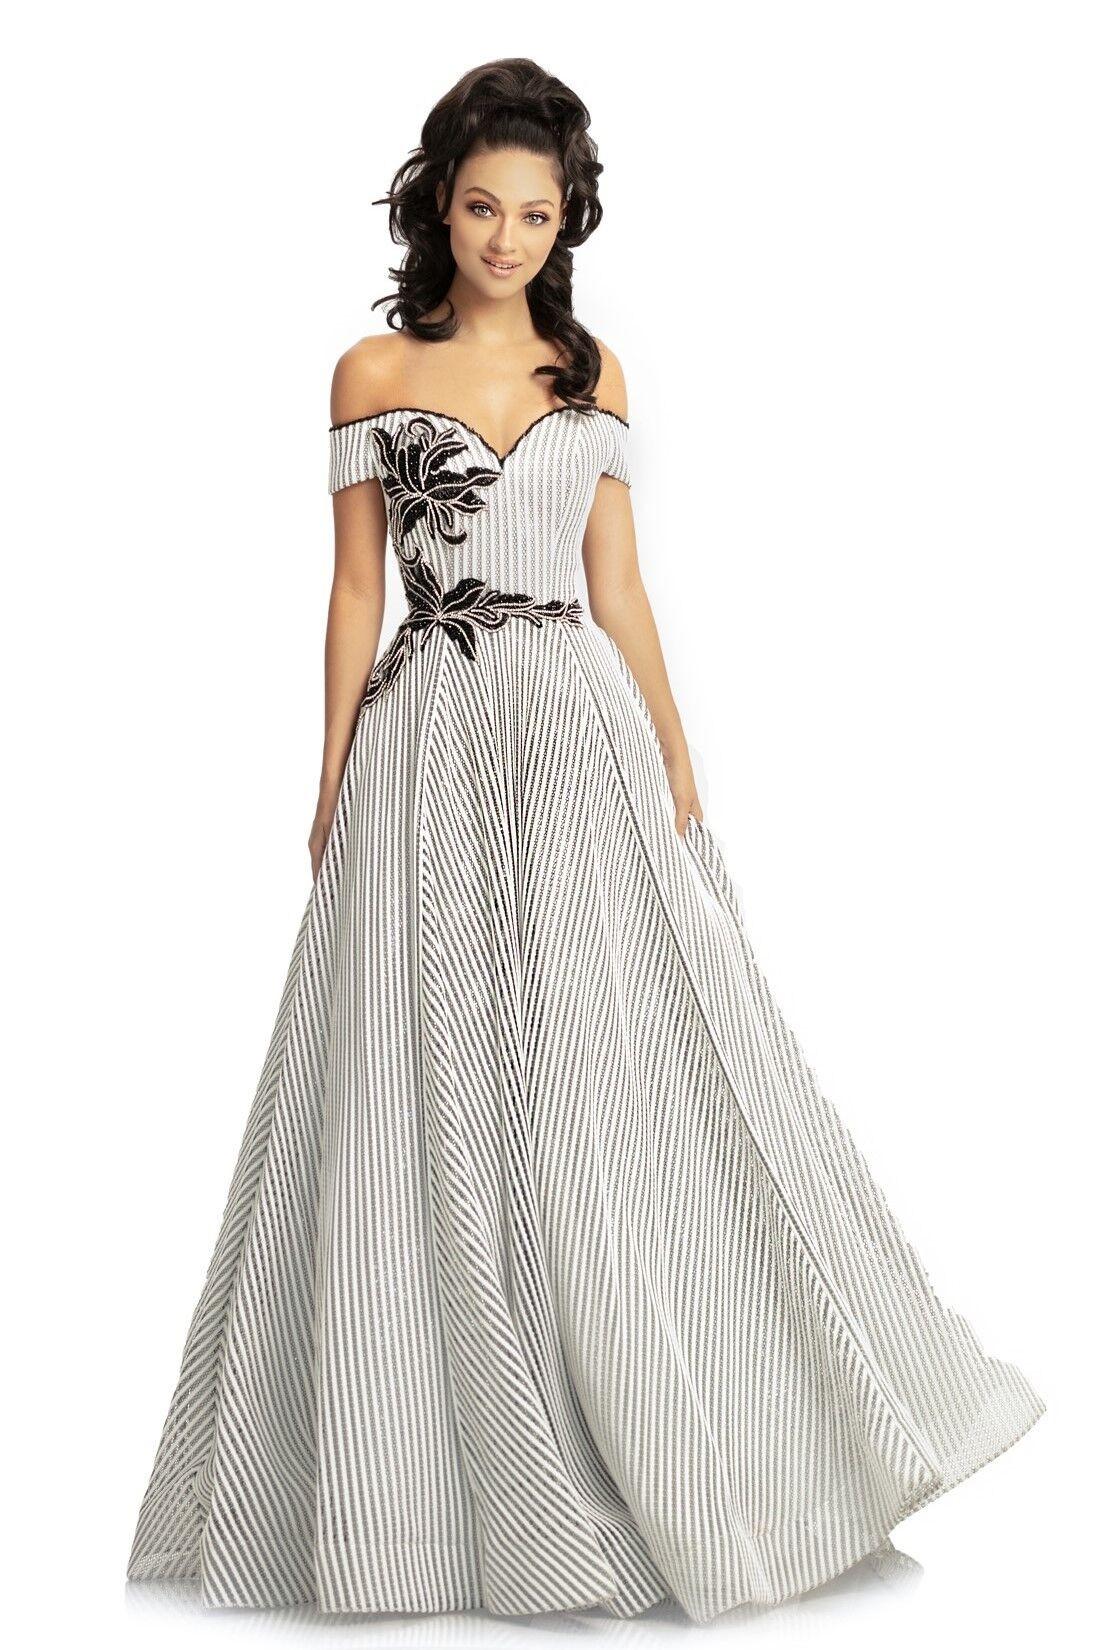 Johnathan Kayne 9048 Black White Front Dress